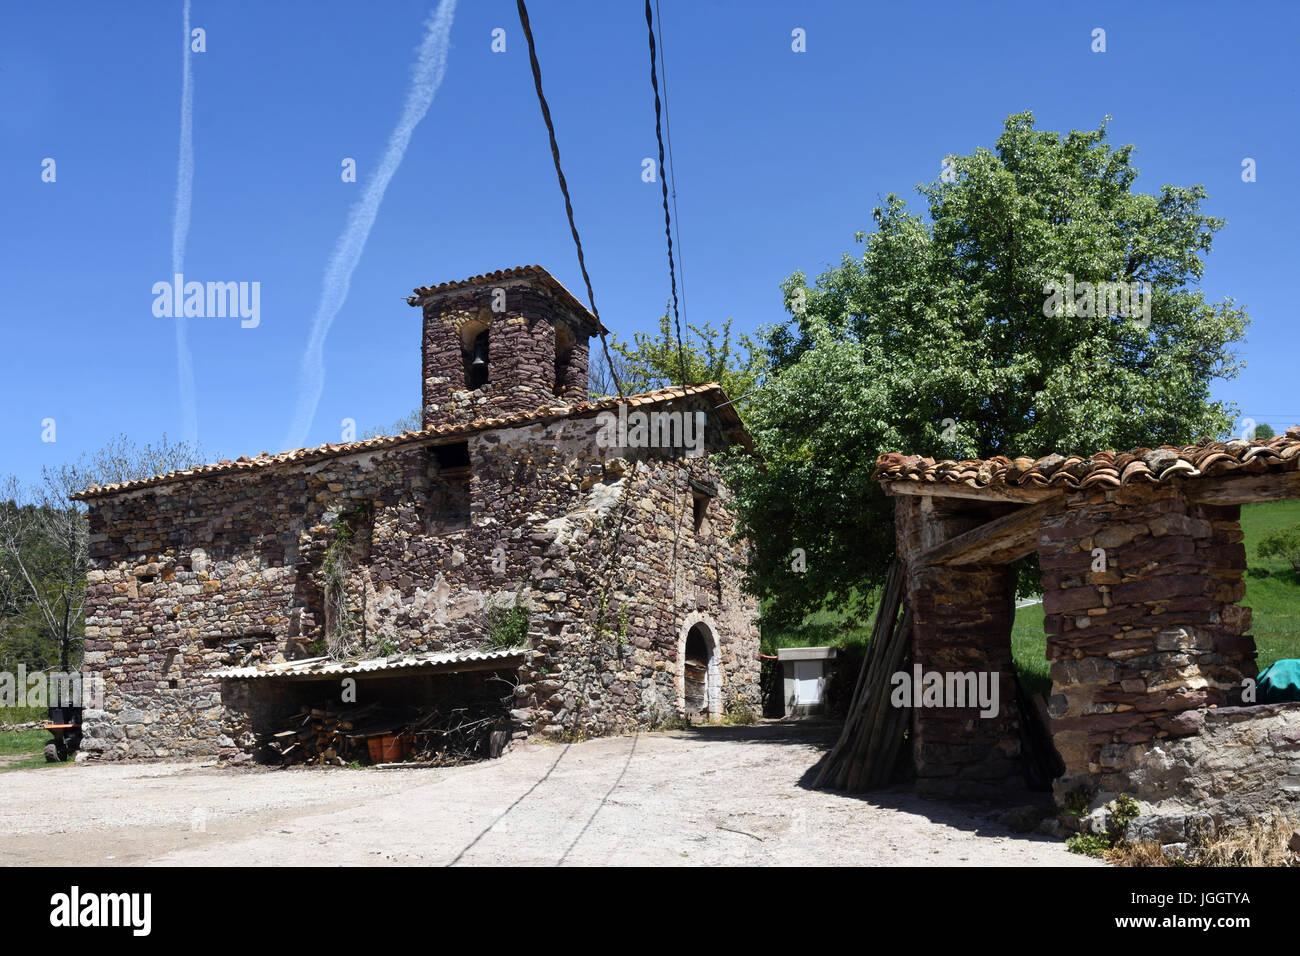 Church of Nuestra Senora de la Asuncion, Piedrehita, Ribagorza, Huesca, Aragon,Spain - Stock Image